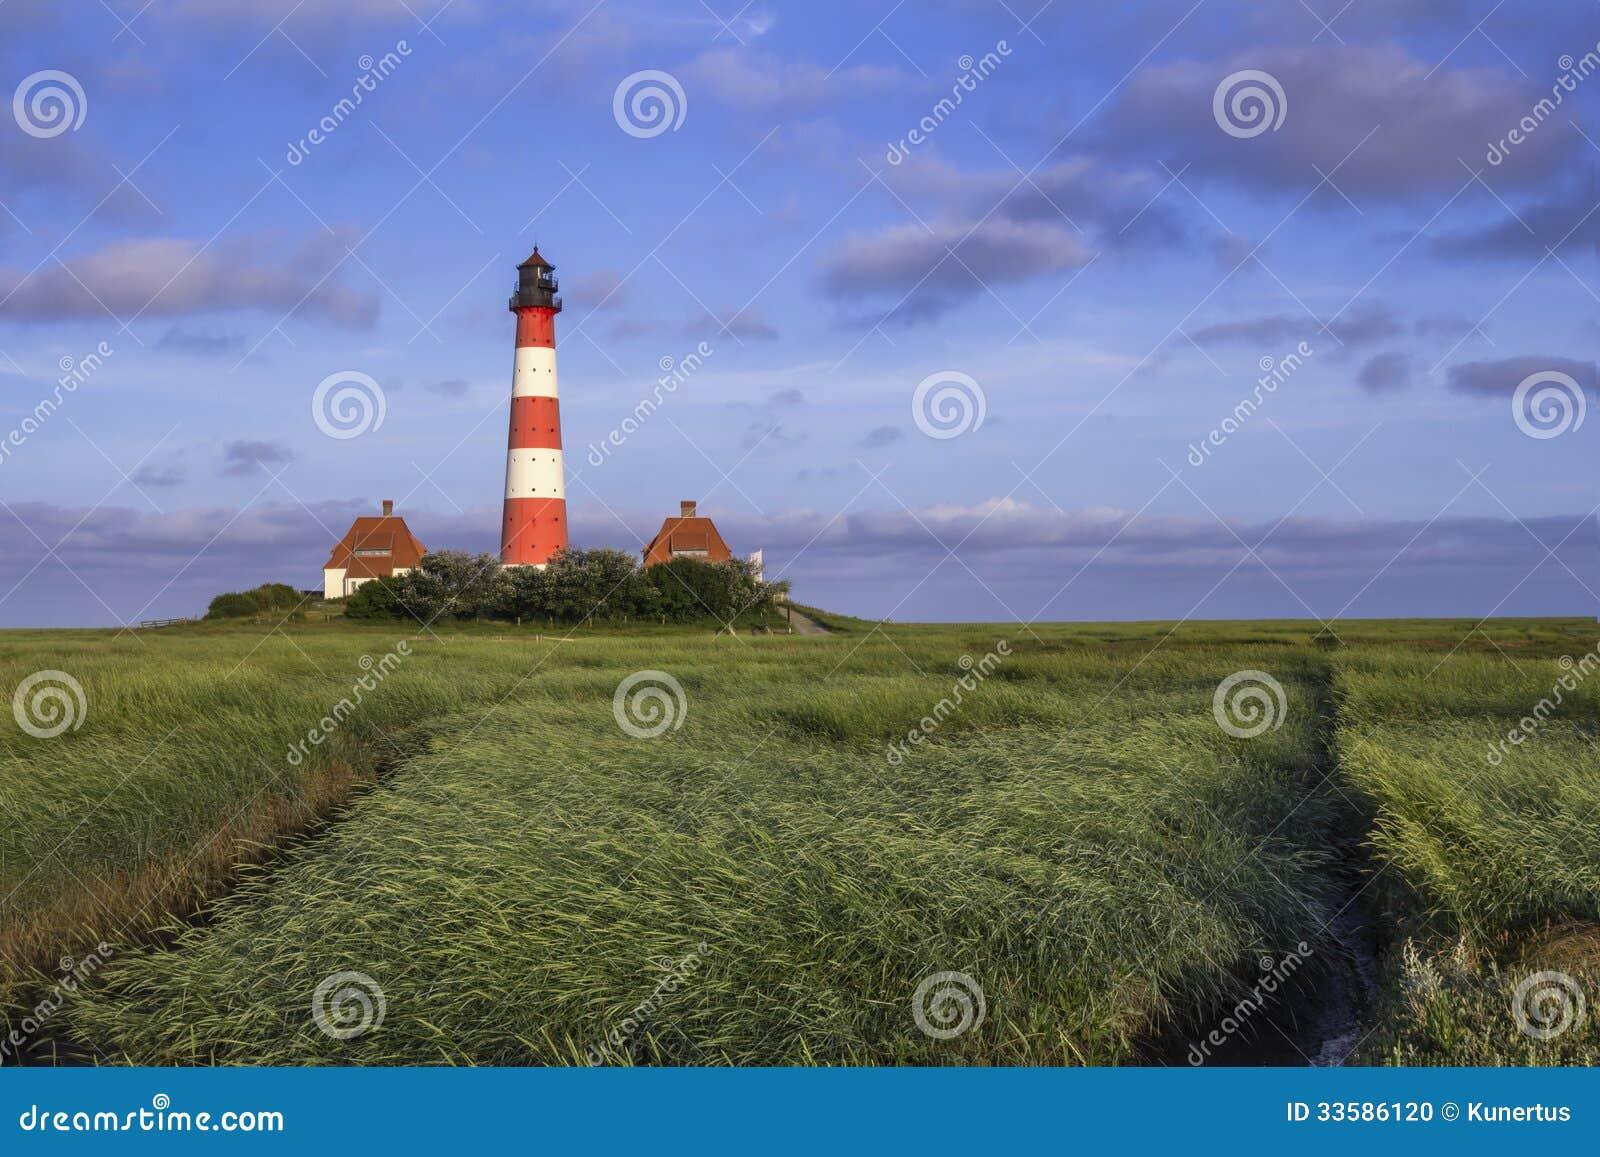 Lighthouse blue Skies